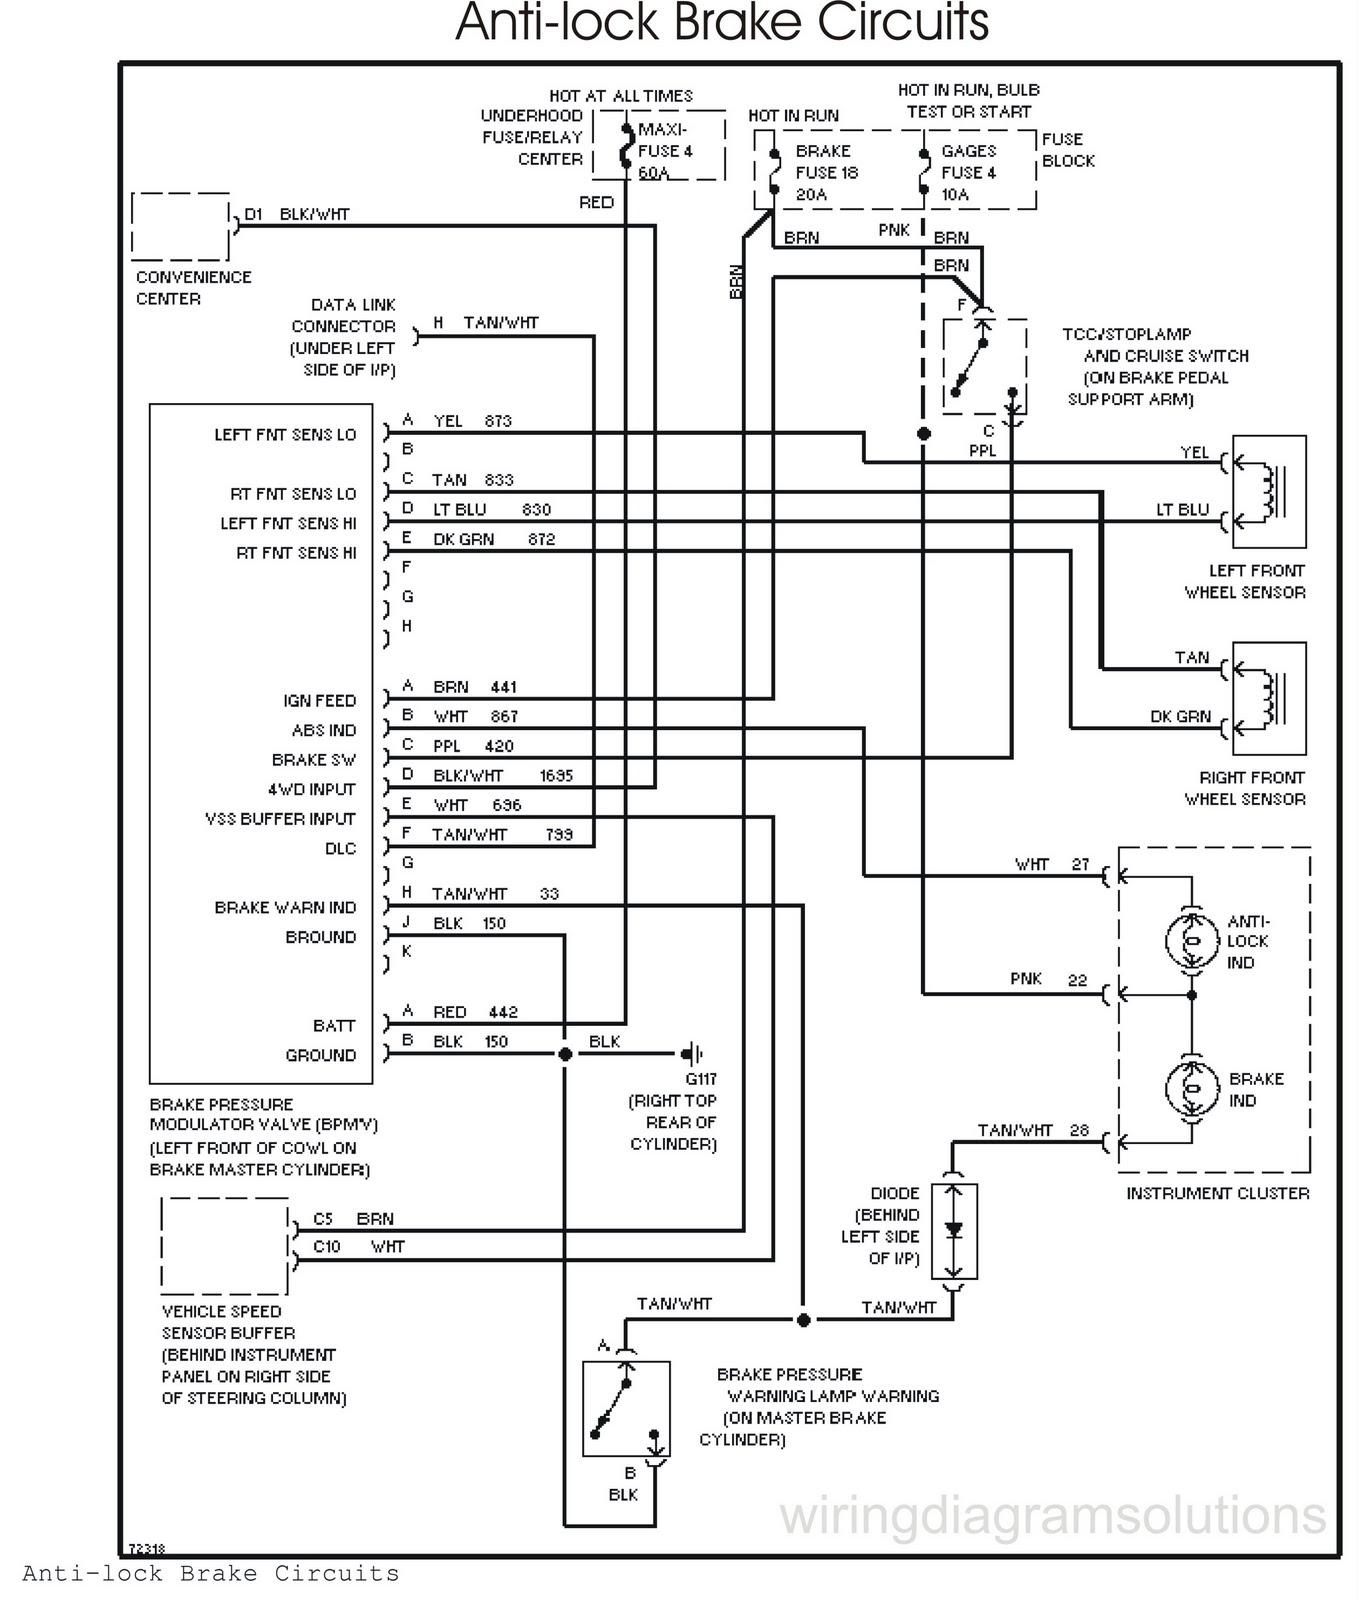 GM_3690] 1998 Chevy Tahoe Brake Switch Wiring Diagram Wiring DiagramAwni Tool Scata Opogo Basi Bemua Cette Mohammedshrine Librar Wiring 101